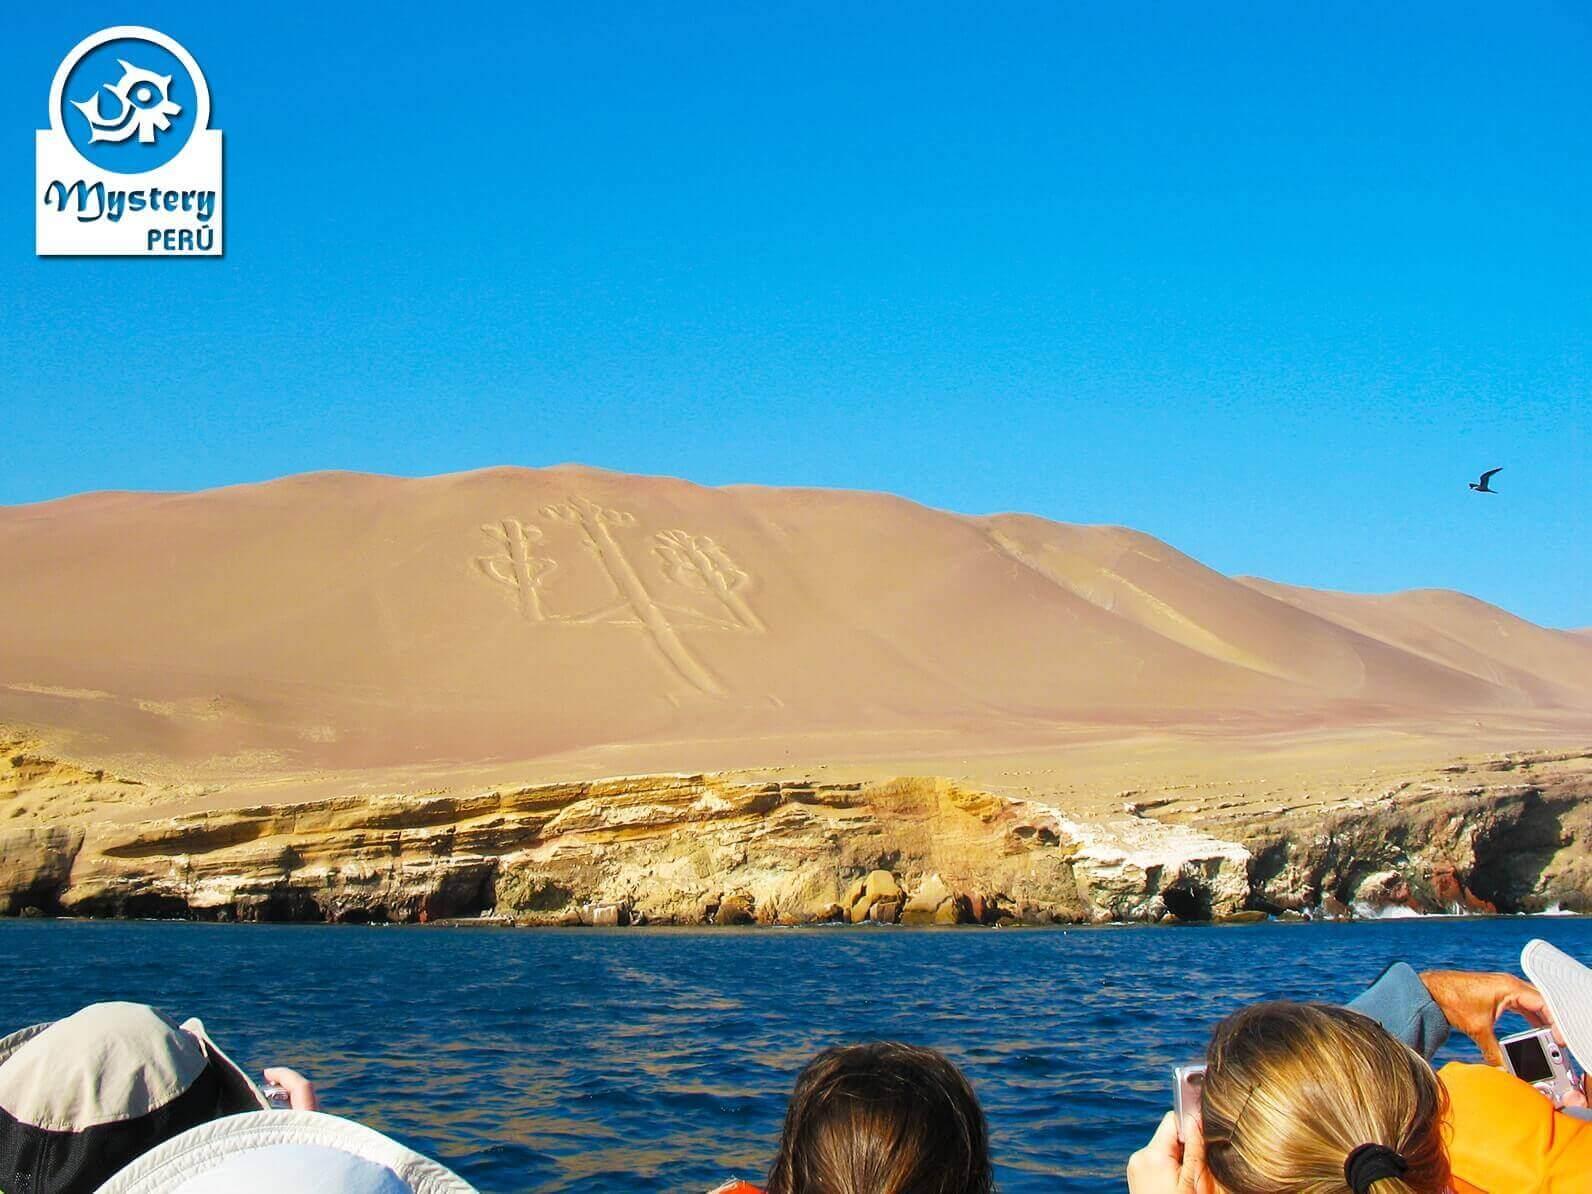 Excursão de 1 dia para as ilhas Ballestas e o oásis de Huacachina